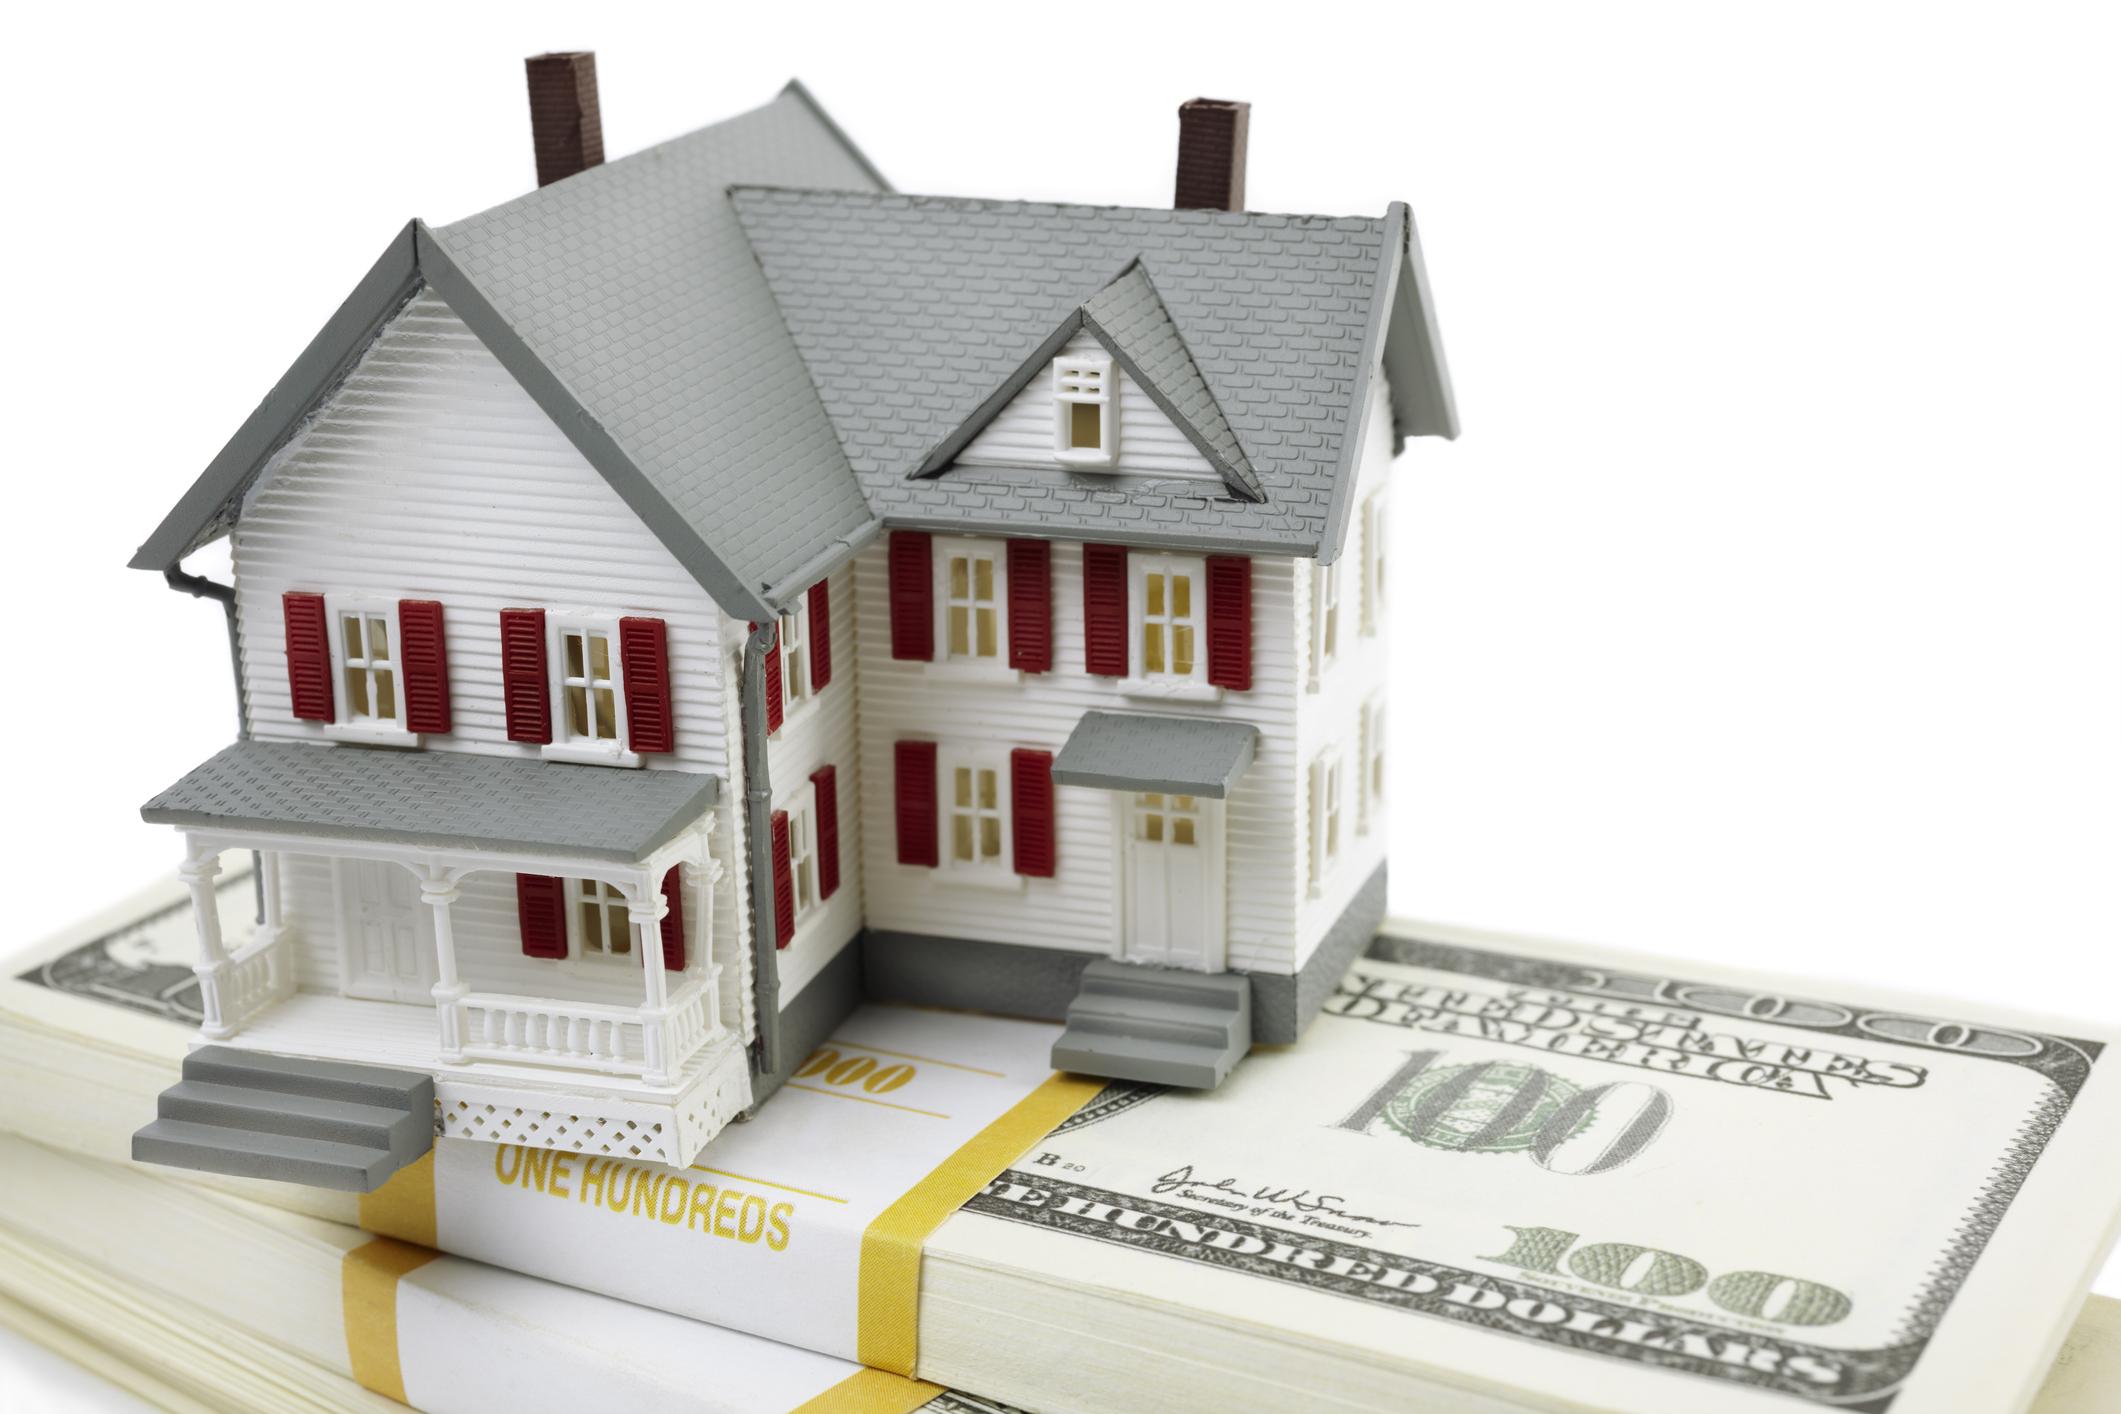 A model of a house sits atop bundles of U.S. $100 bills.